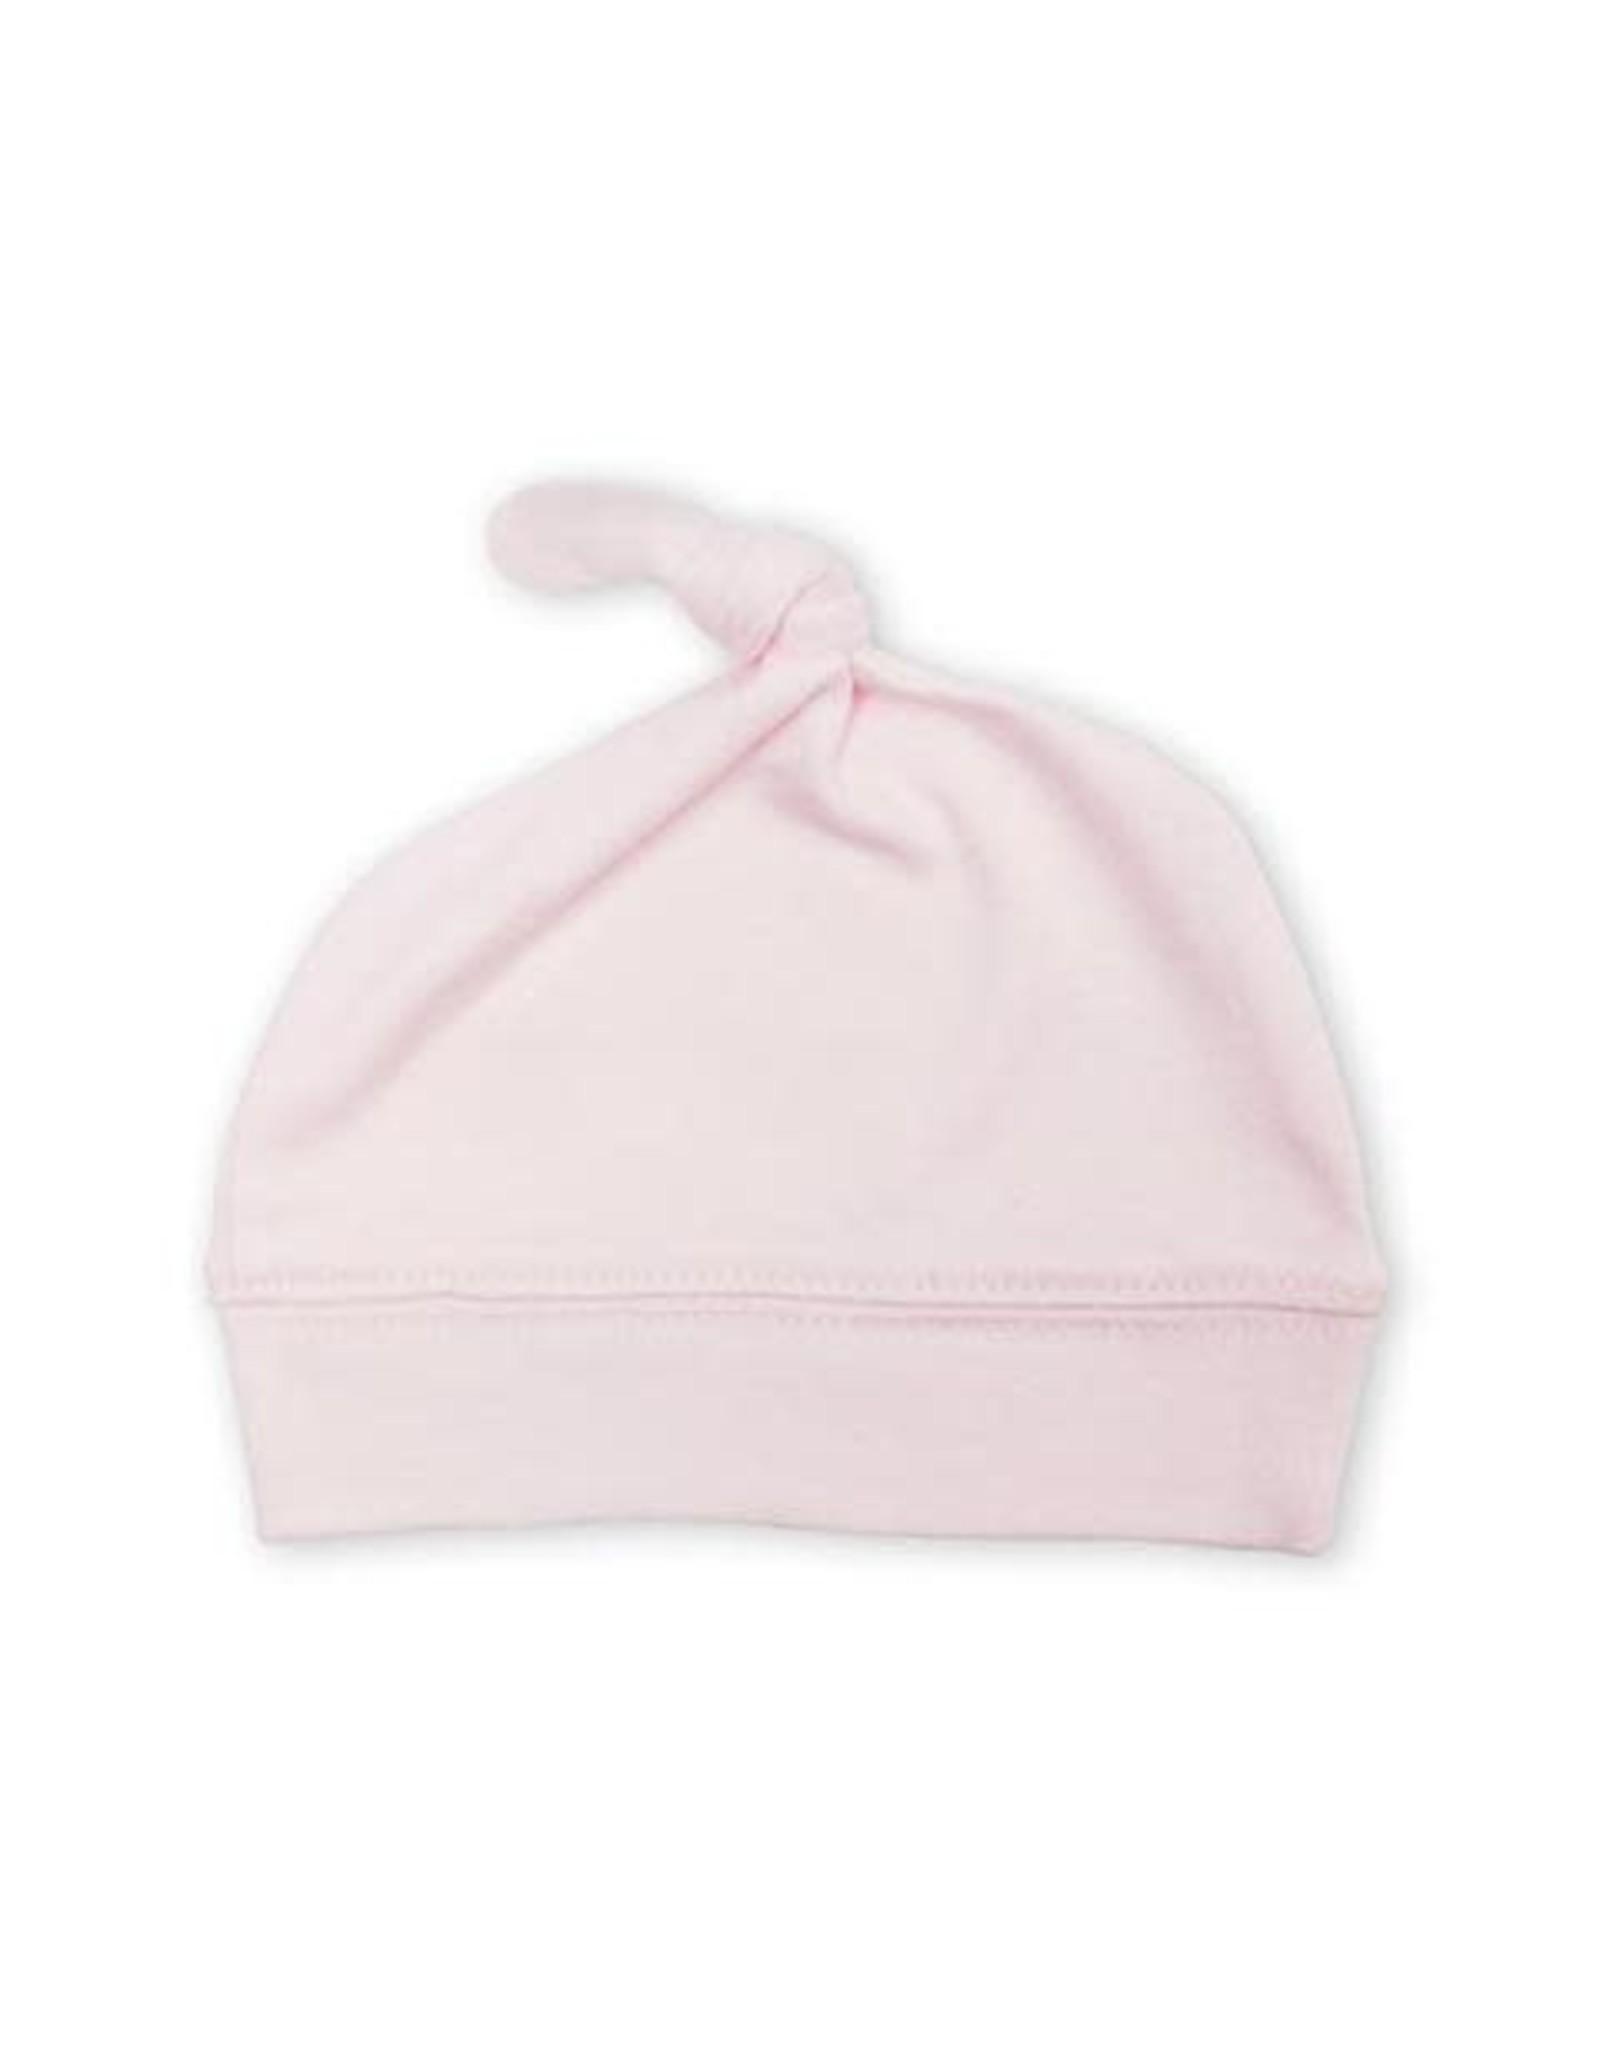 Lulujo Baby Lulujo Bamboo Hat, Pink